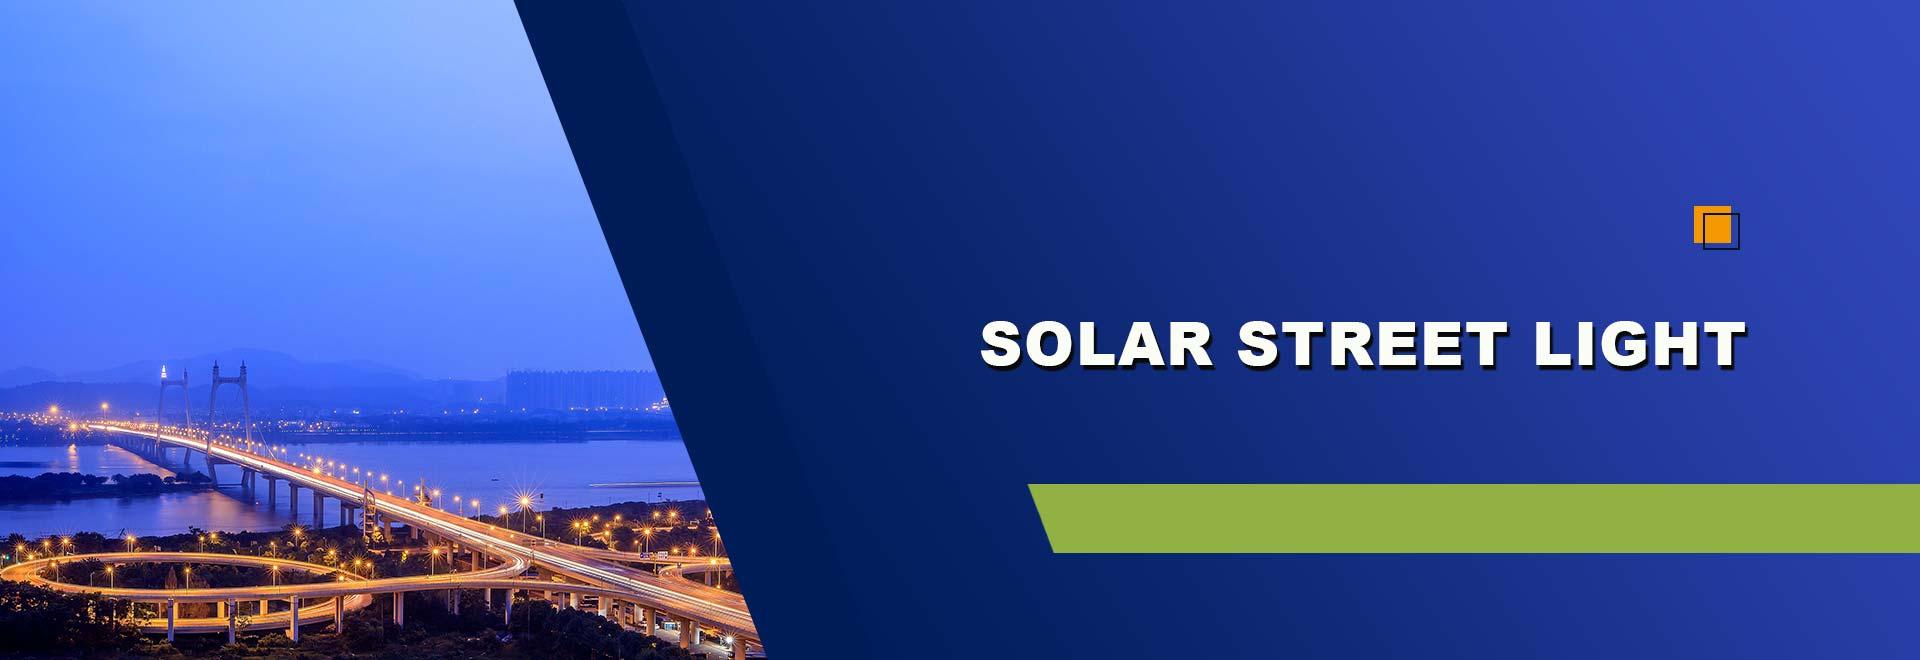 SOLAR STREER LIGHT